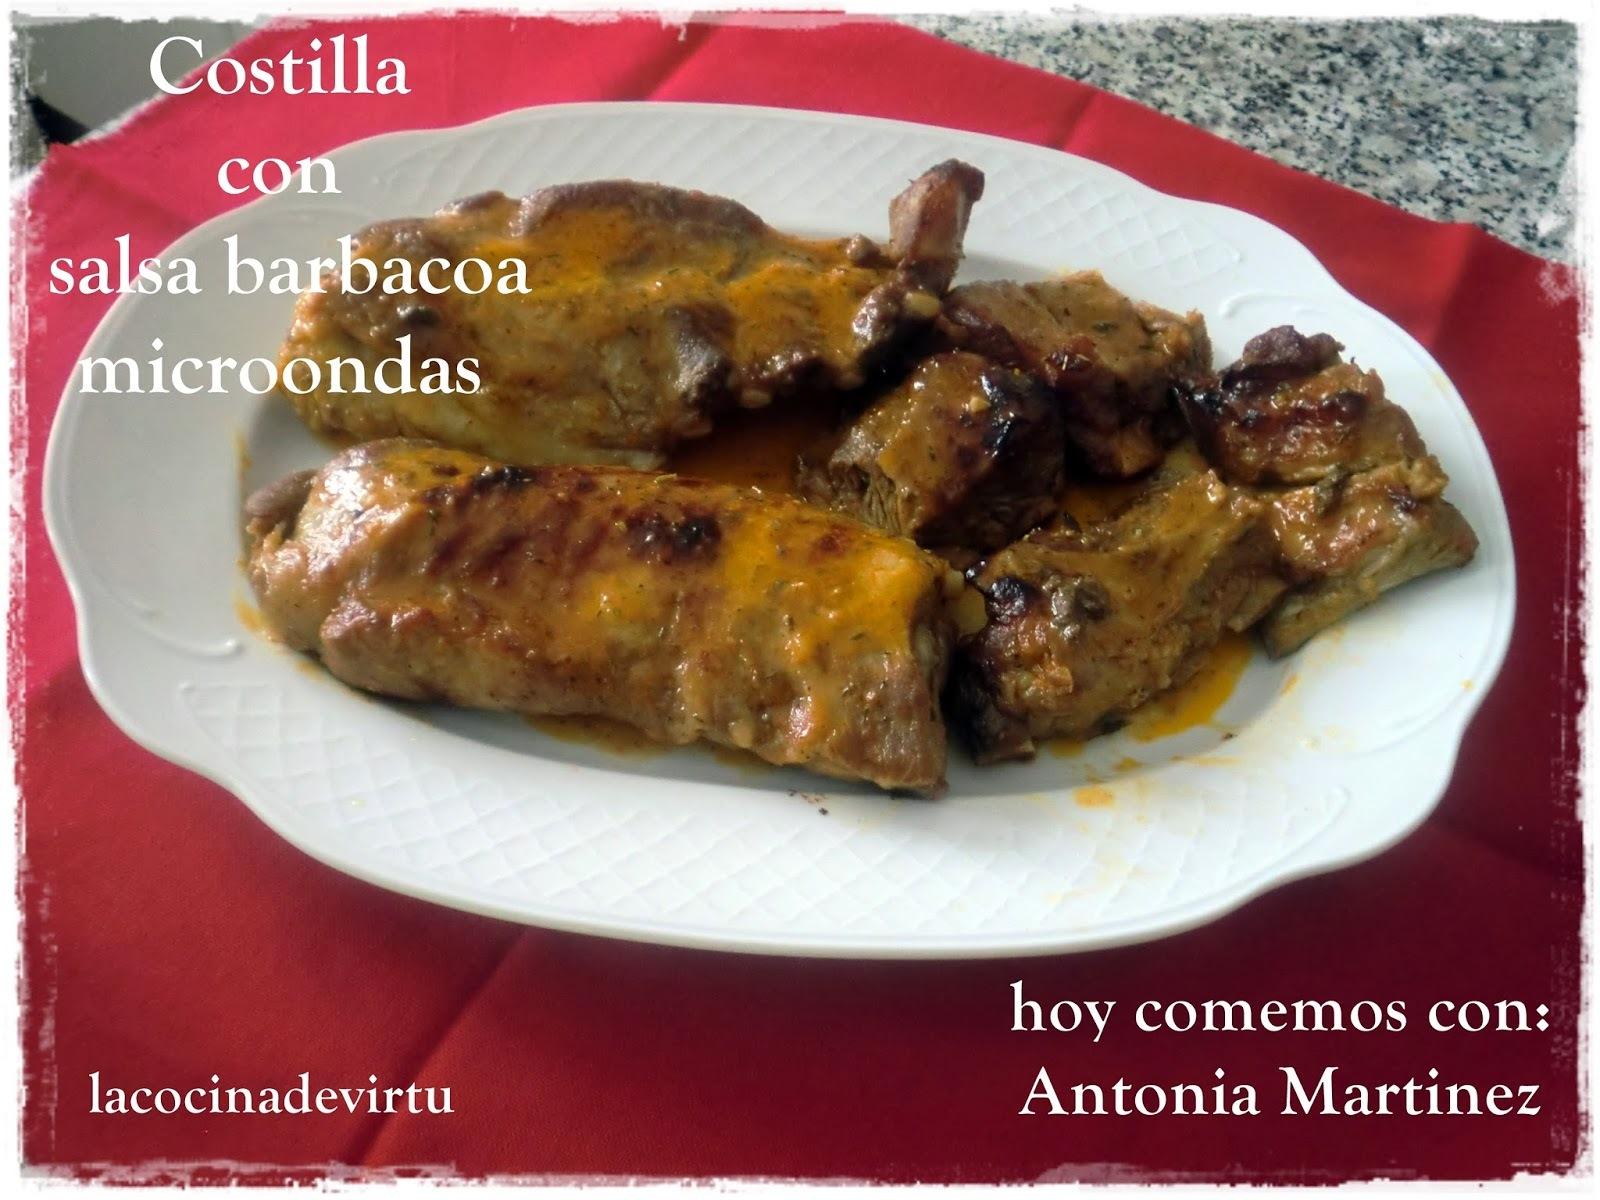 HOY COMEMOS CON: Antonia Martinez COSTILLA DE CERDO CON SALSA BARBACOA. microondas